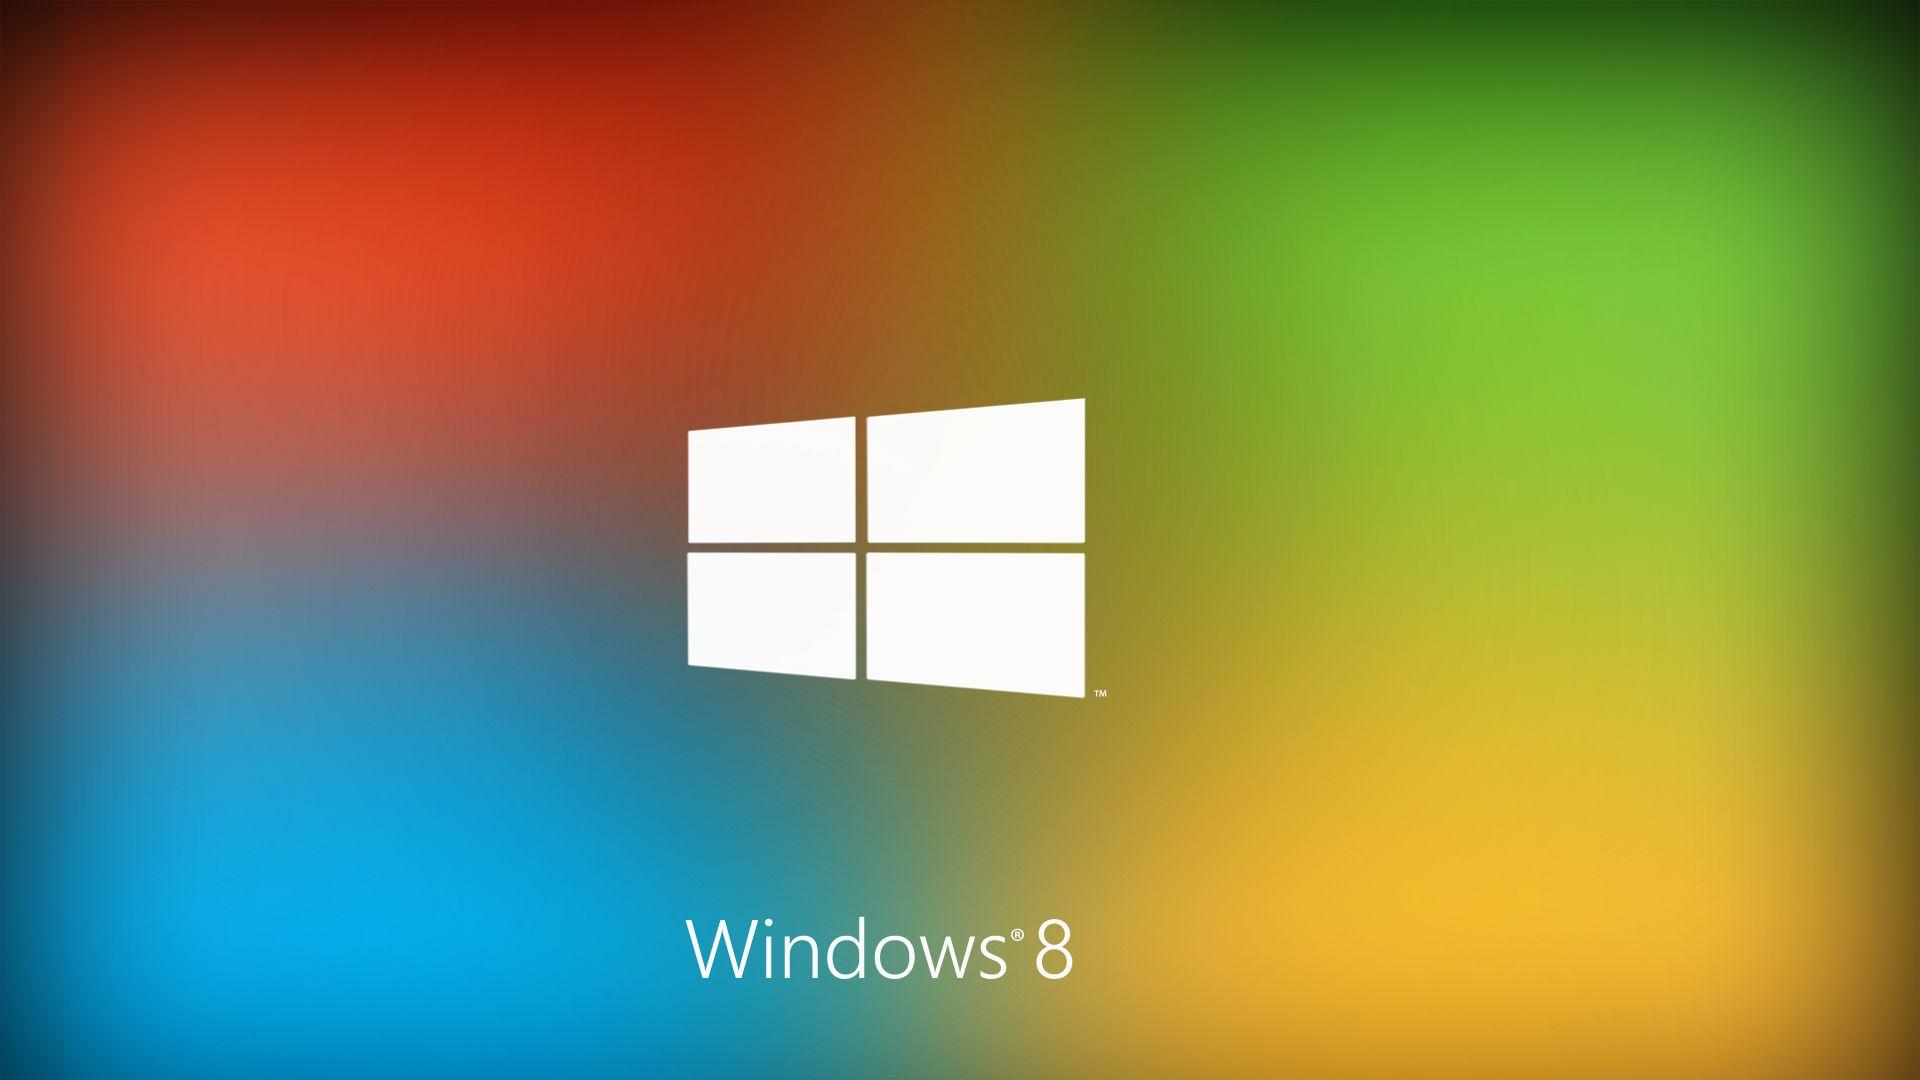 Microsoft Windows HD Desktop Wallpaper Amazing Wallpaperz 1920x1200 8 Wallpapers 42